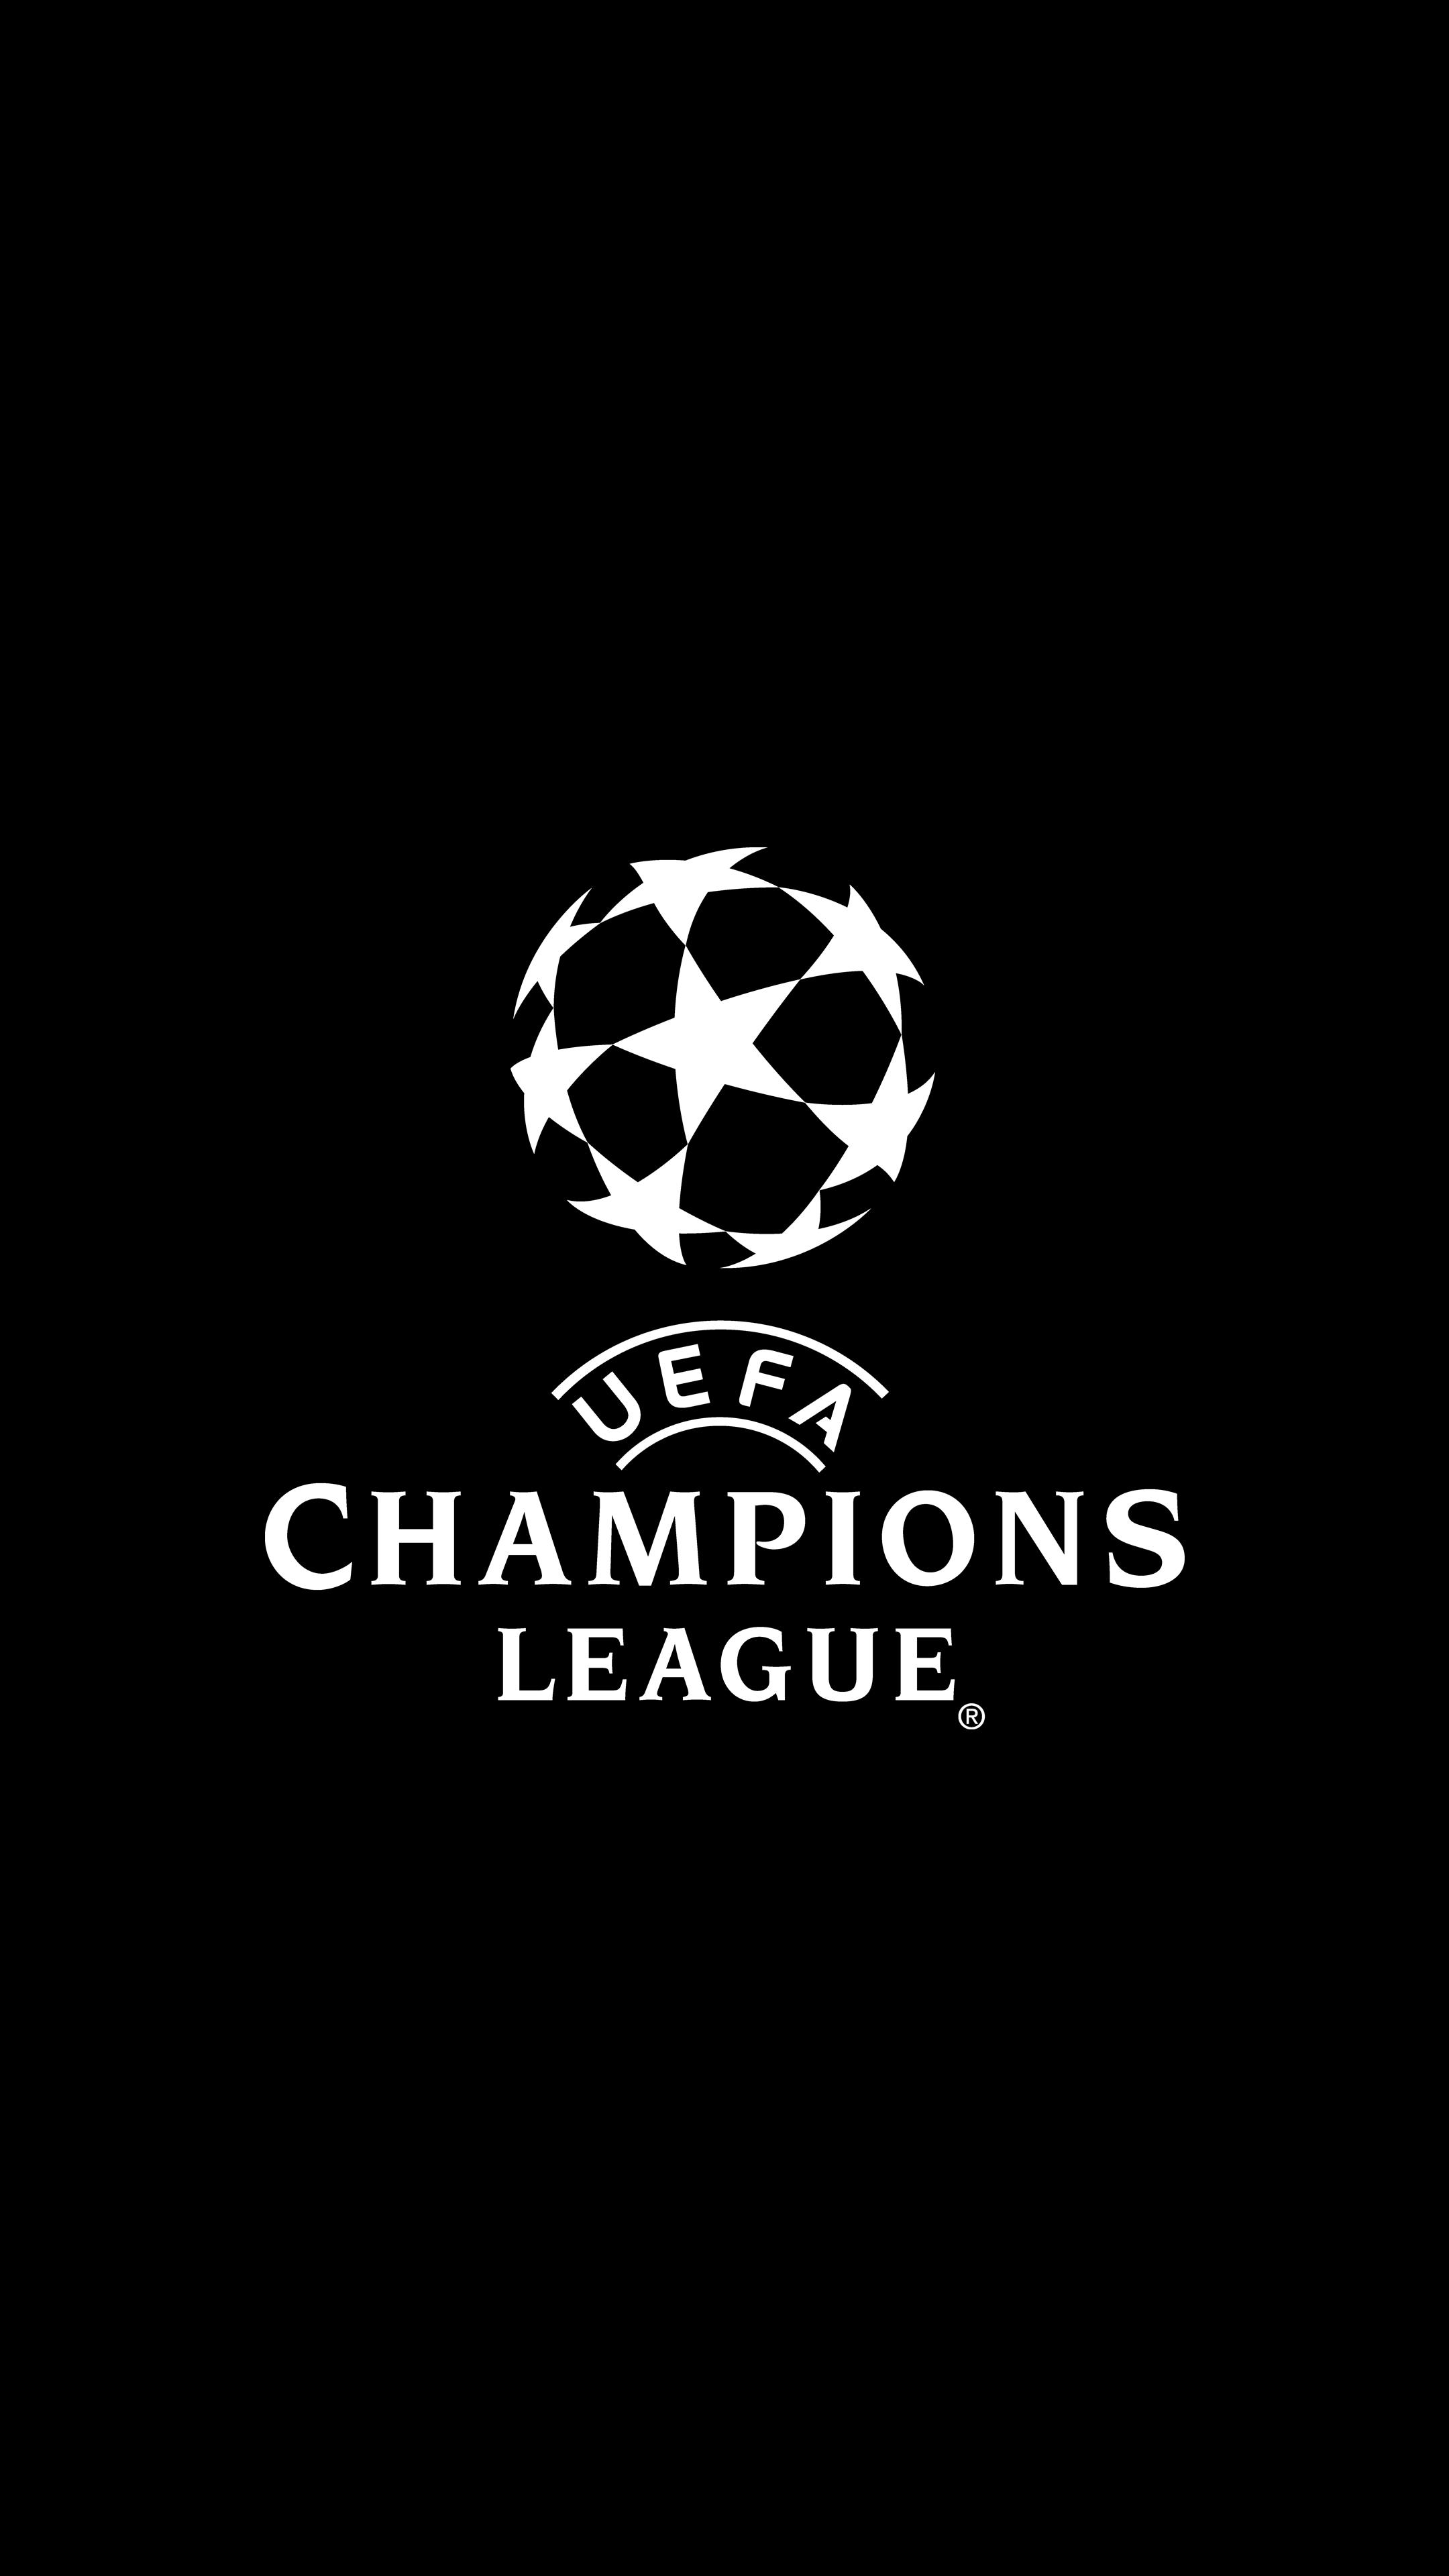 uefa champions league wallpapers finals uefa champions league wallpapers in 2020 champions league uefa champions league champions league europe pinterest